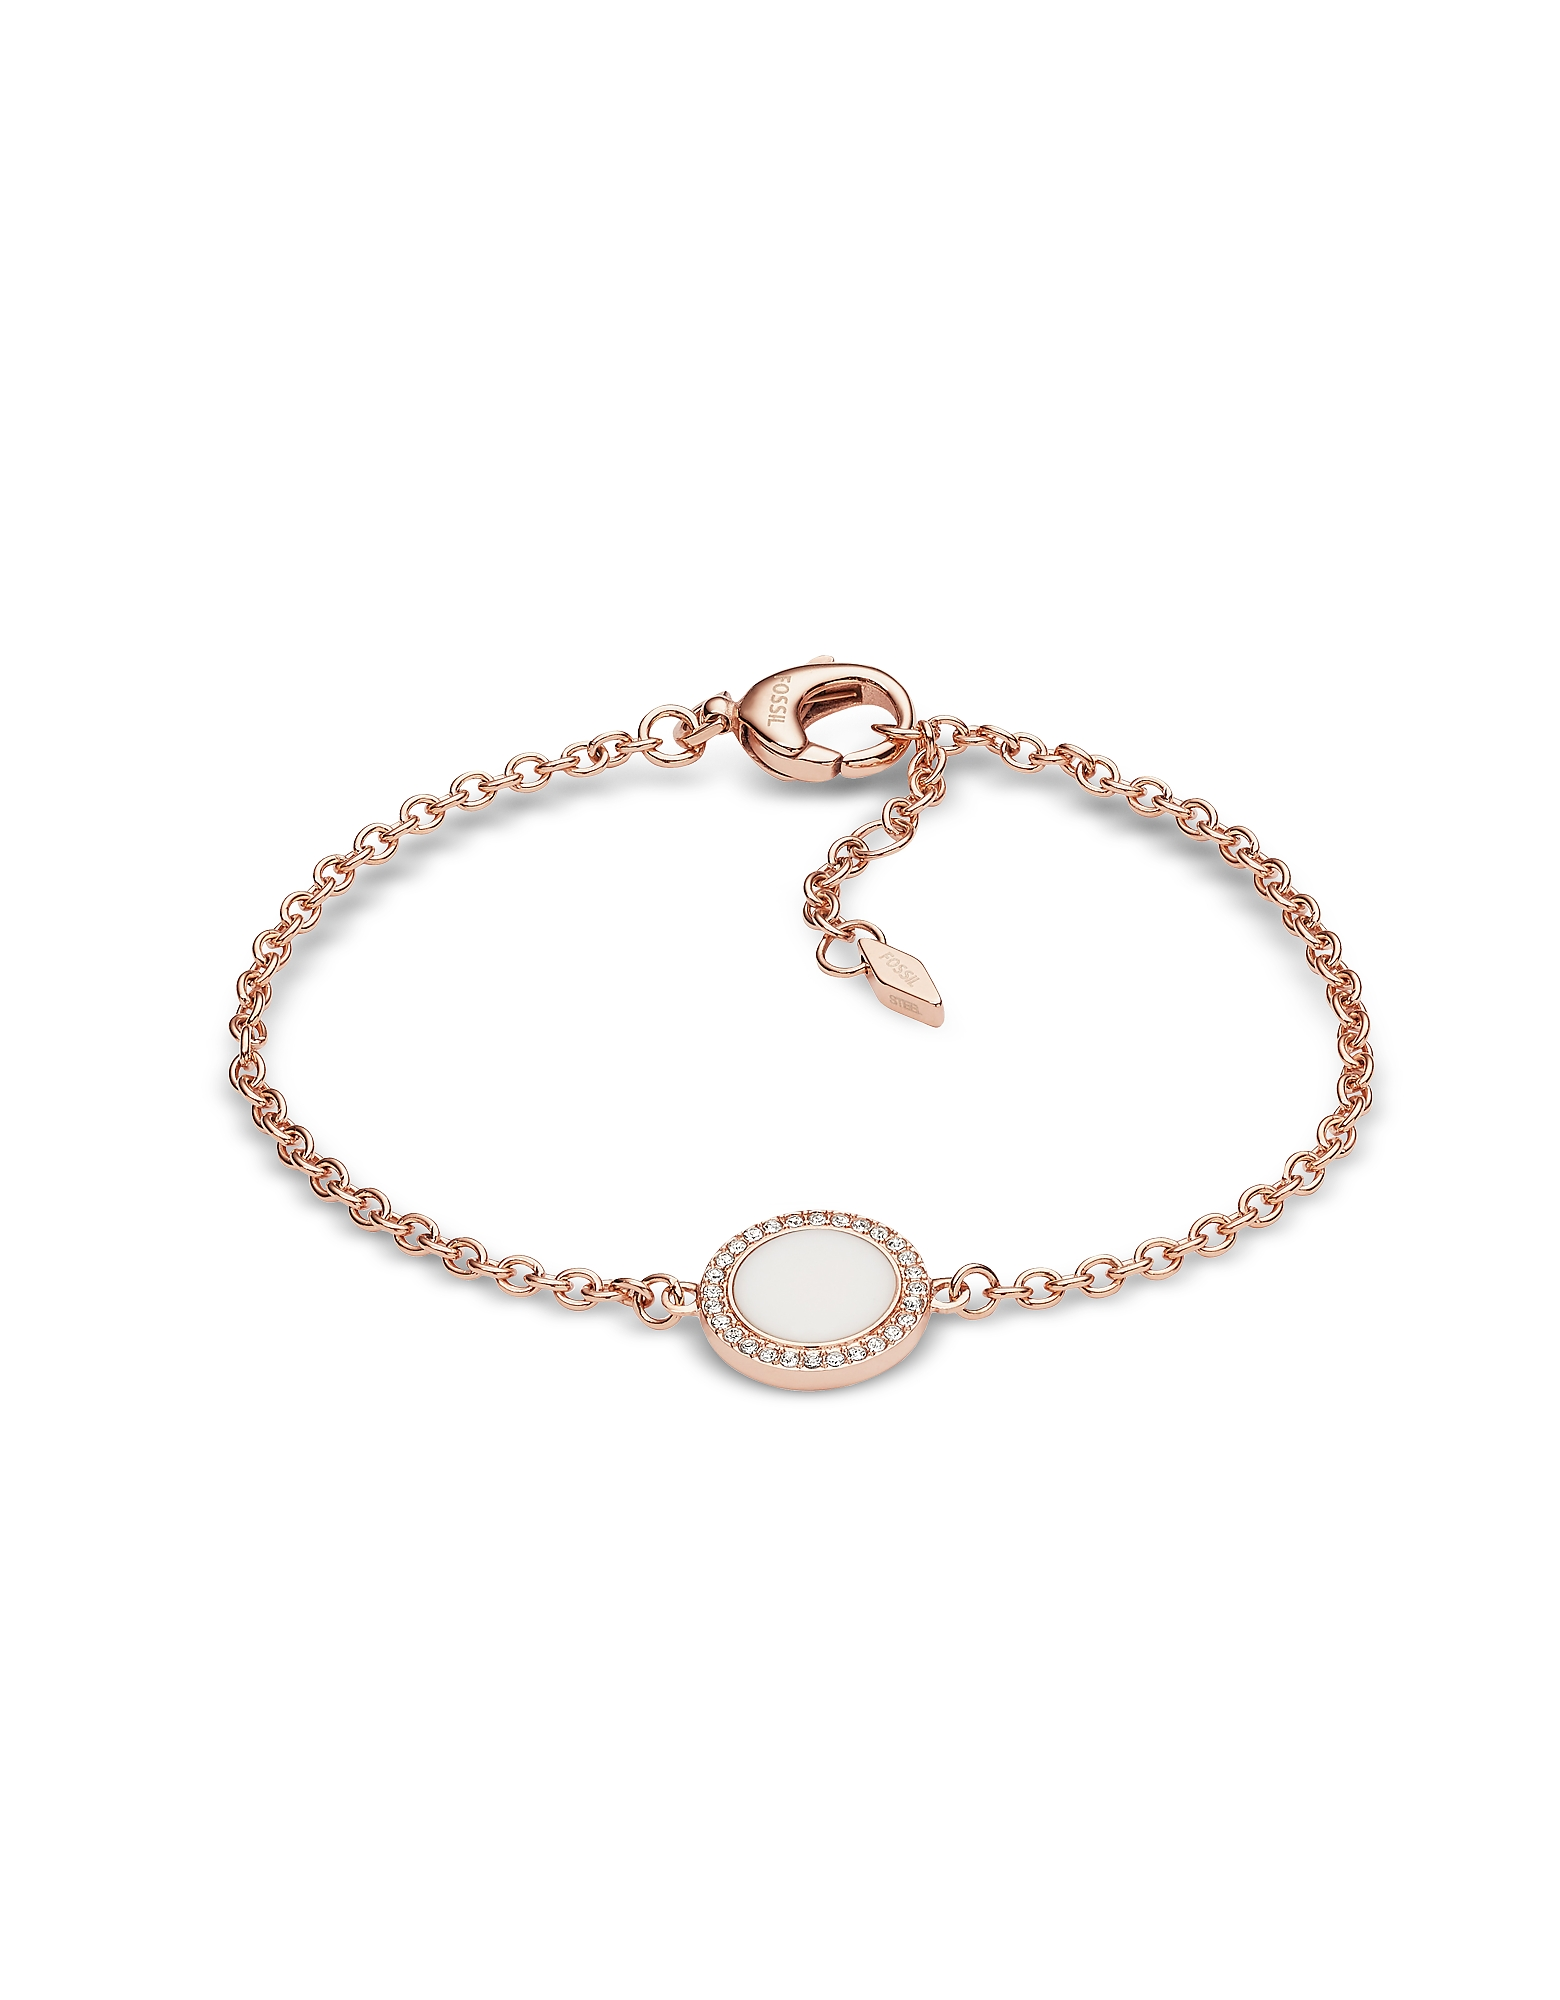 Stone Glitz Chain Women's Bracelet